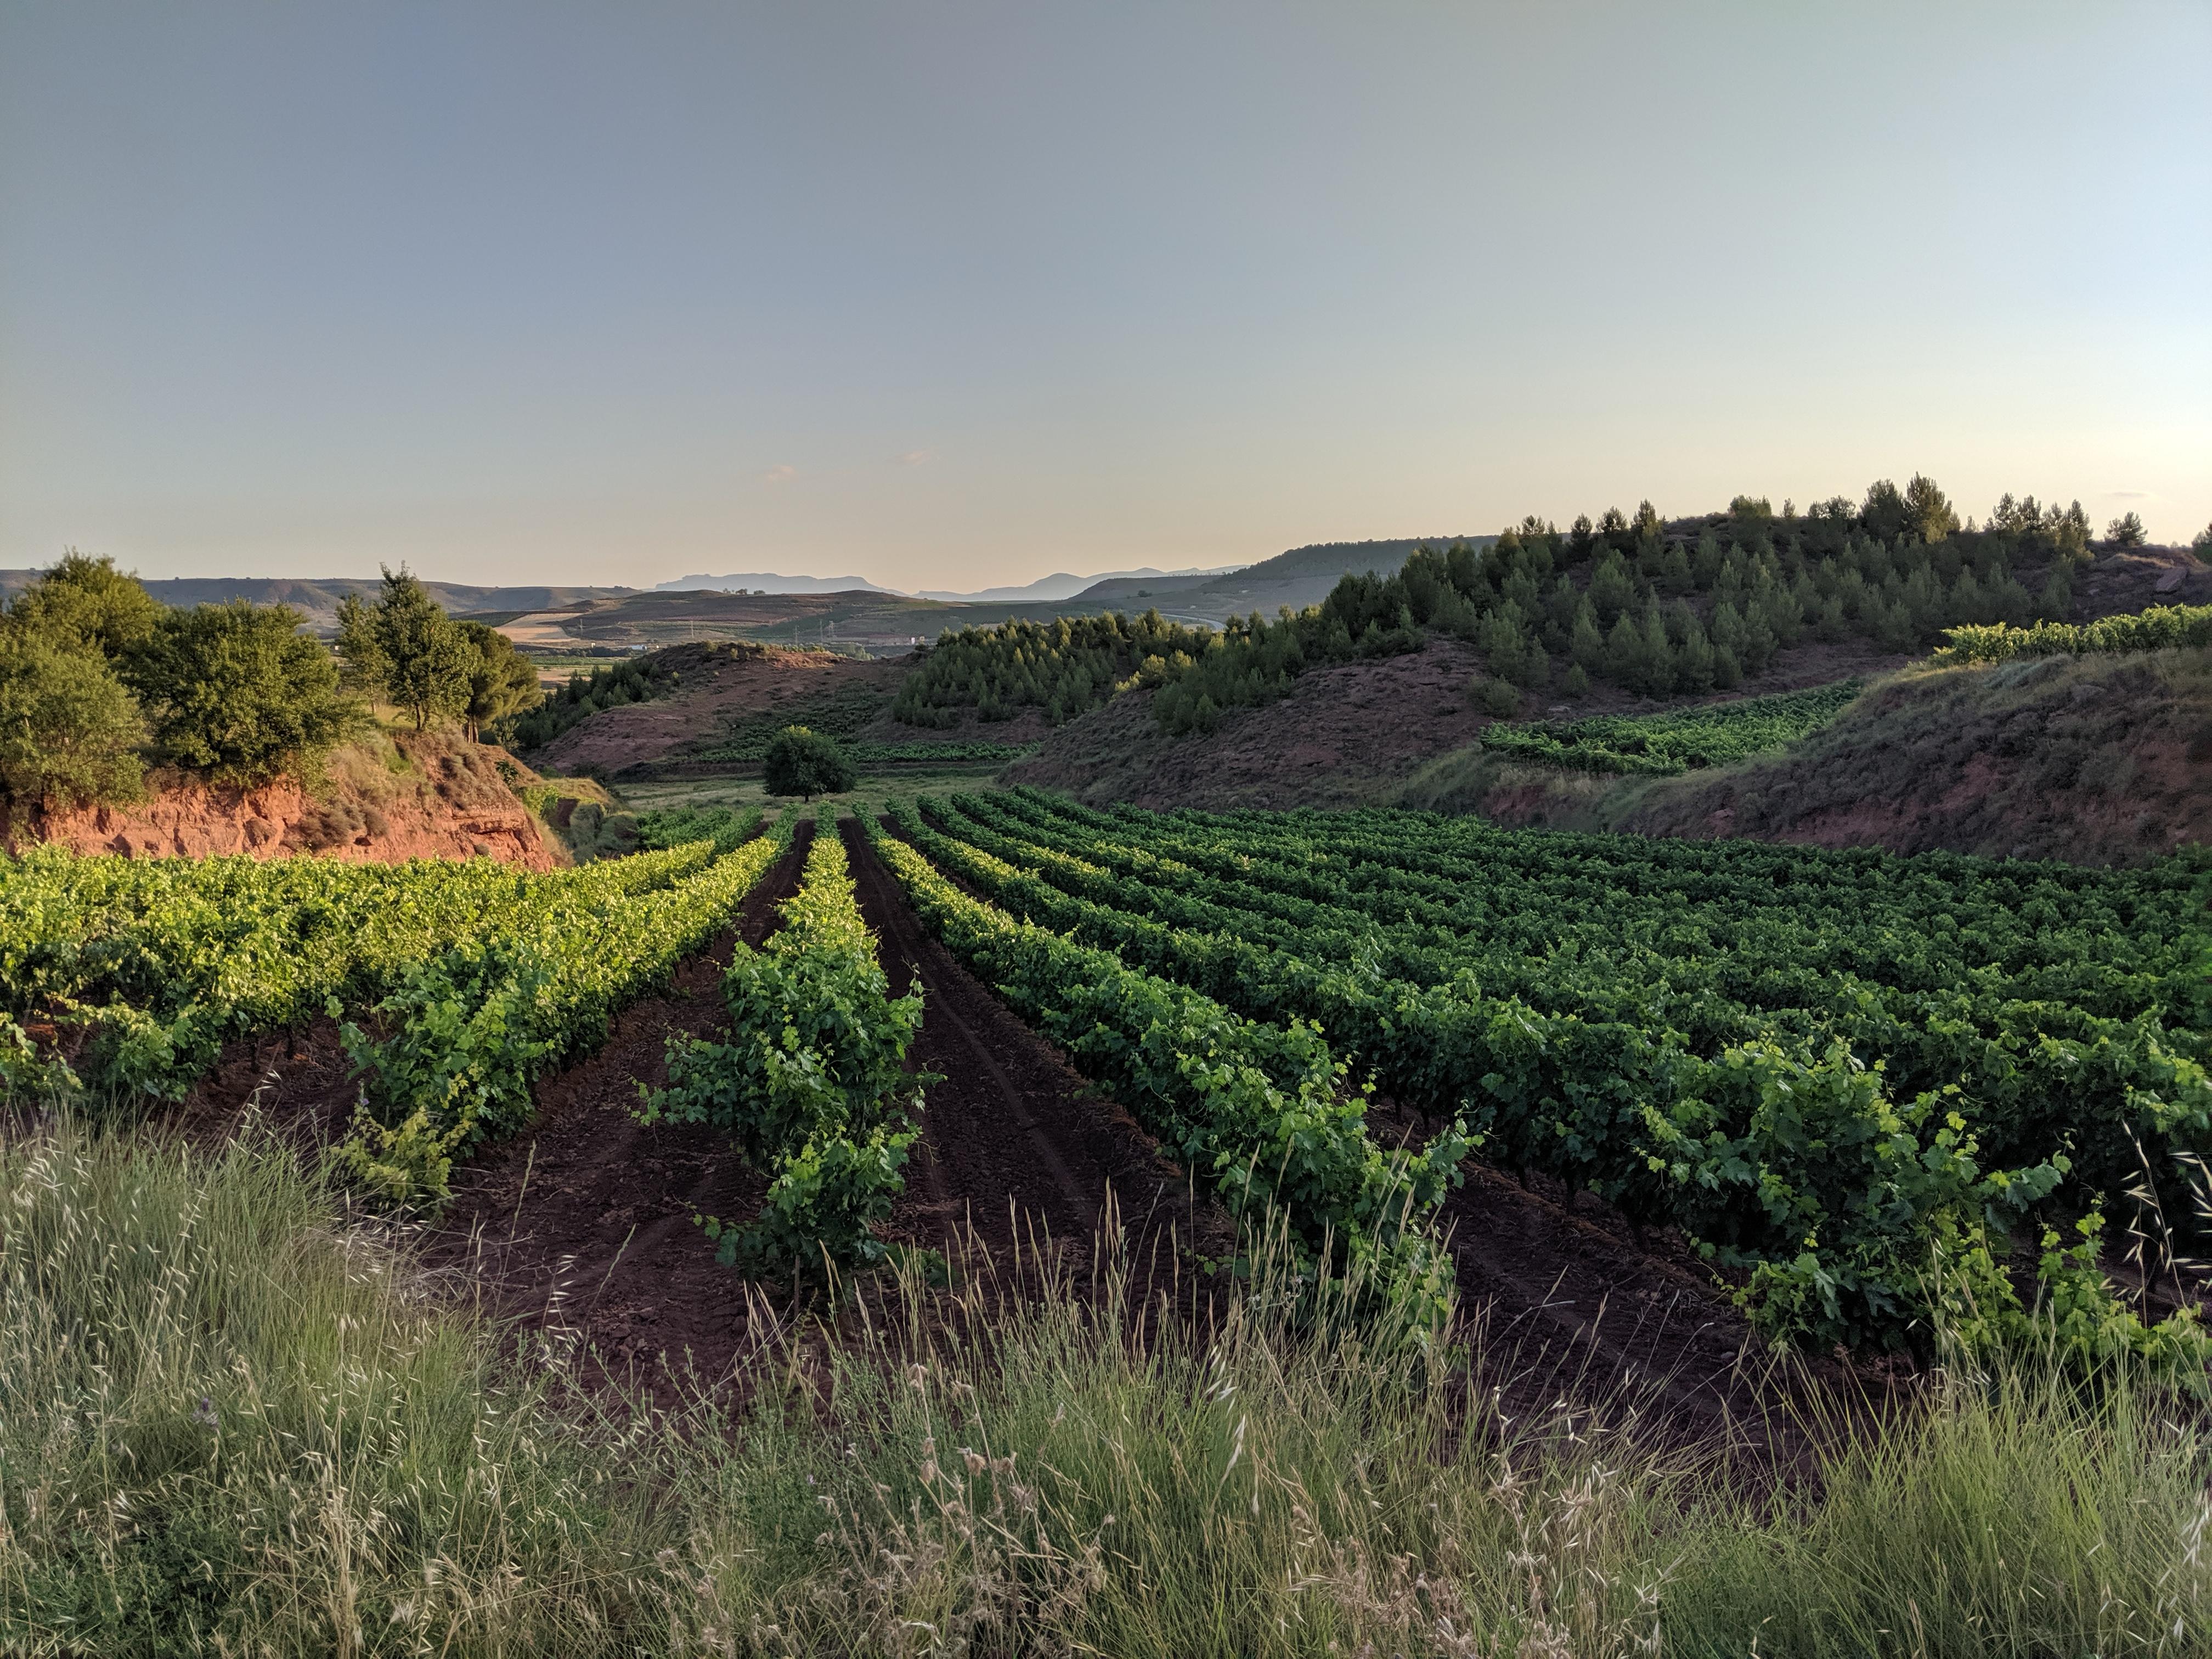 Spain, Spanish countryside, el Camino